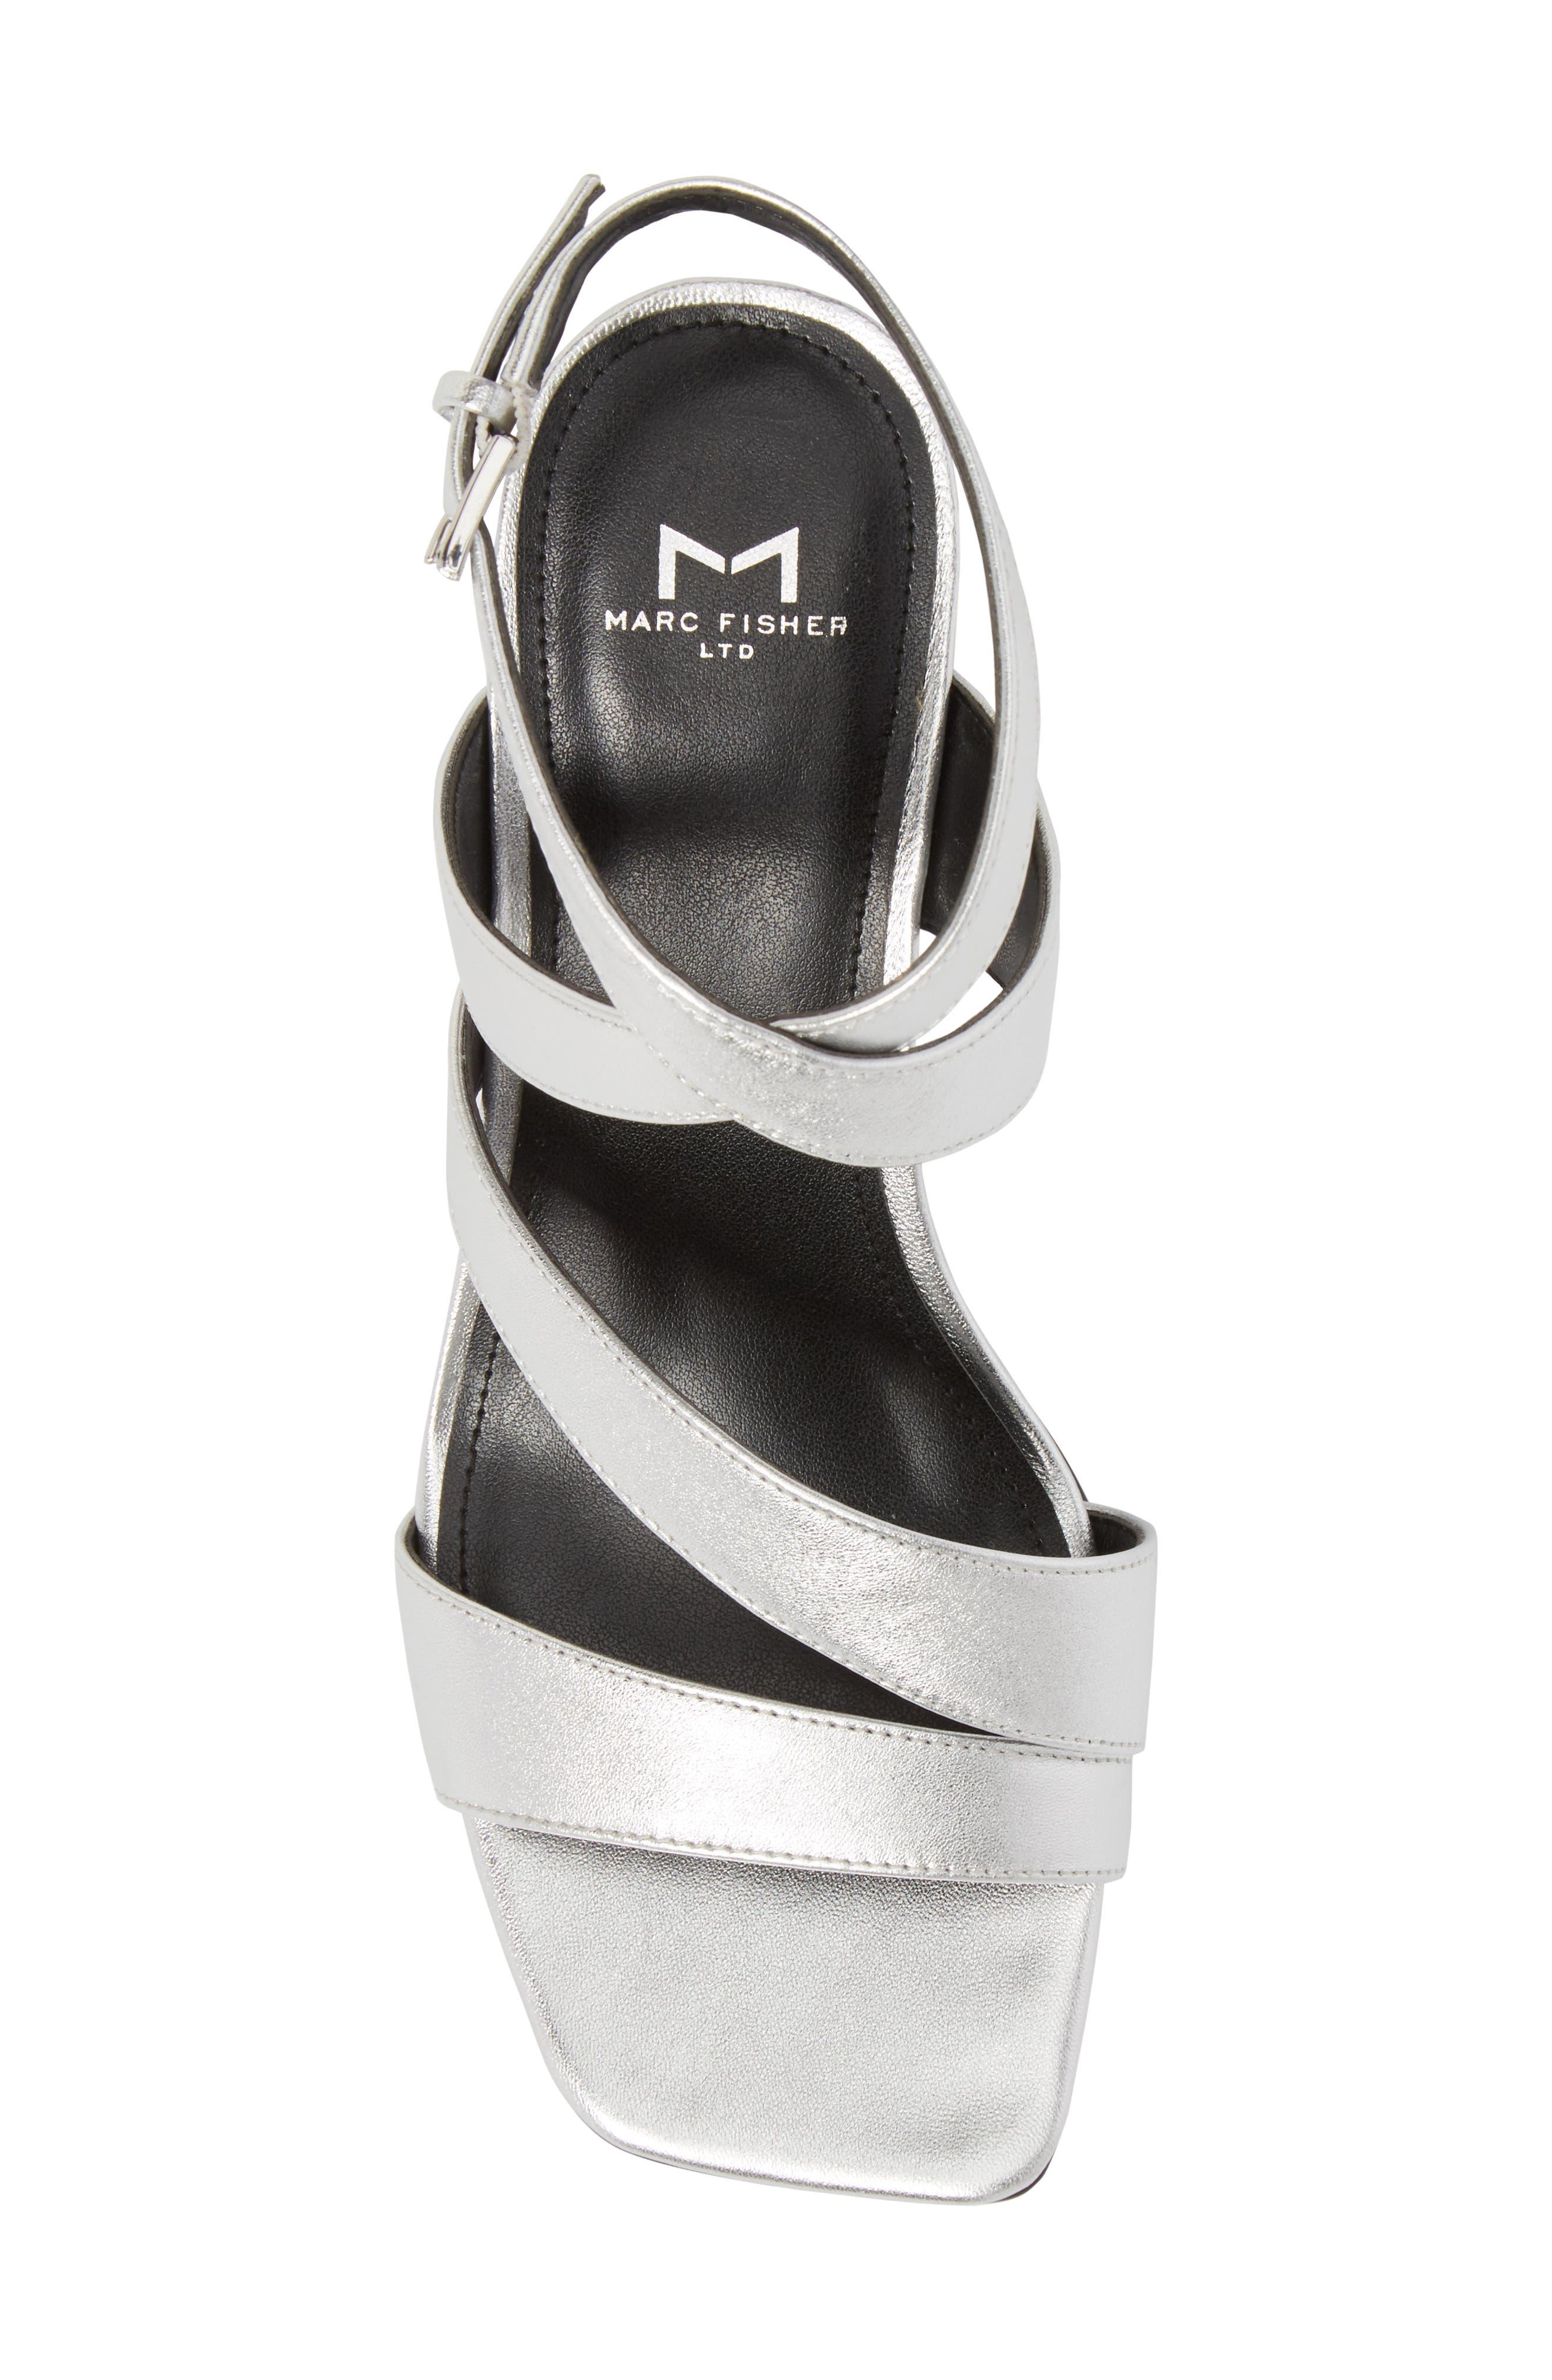 Marc Fischer LTD Idana Strappy Sandal,                             Alternate thumbnail 5, color,                             Silver Leather